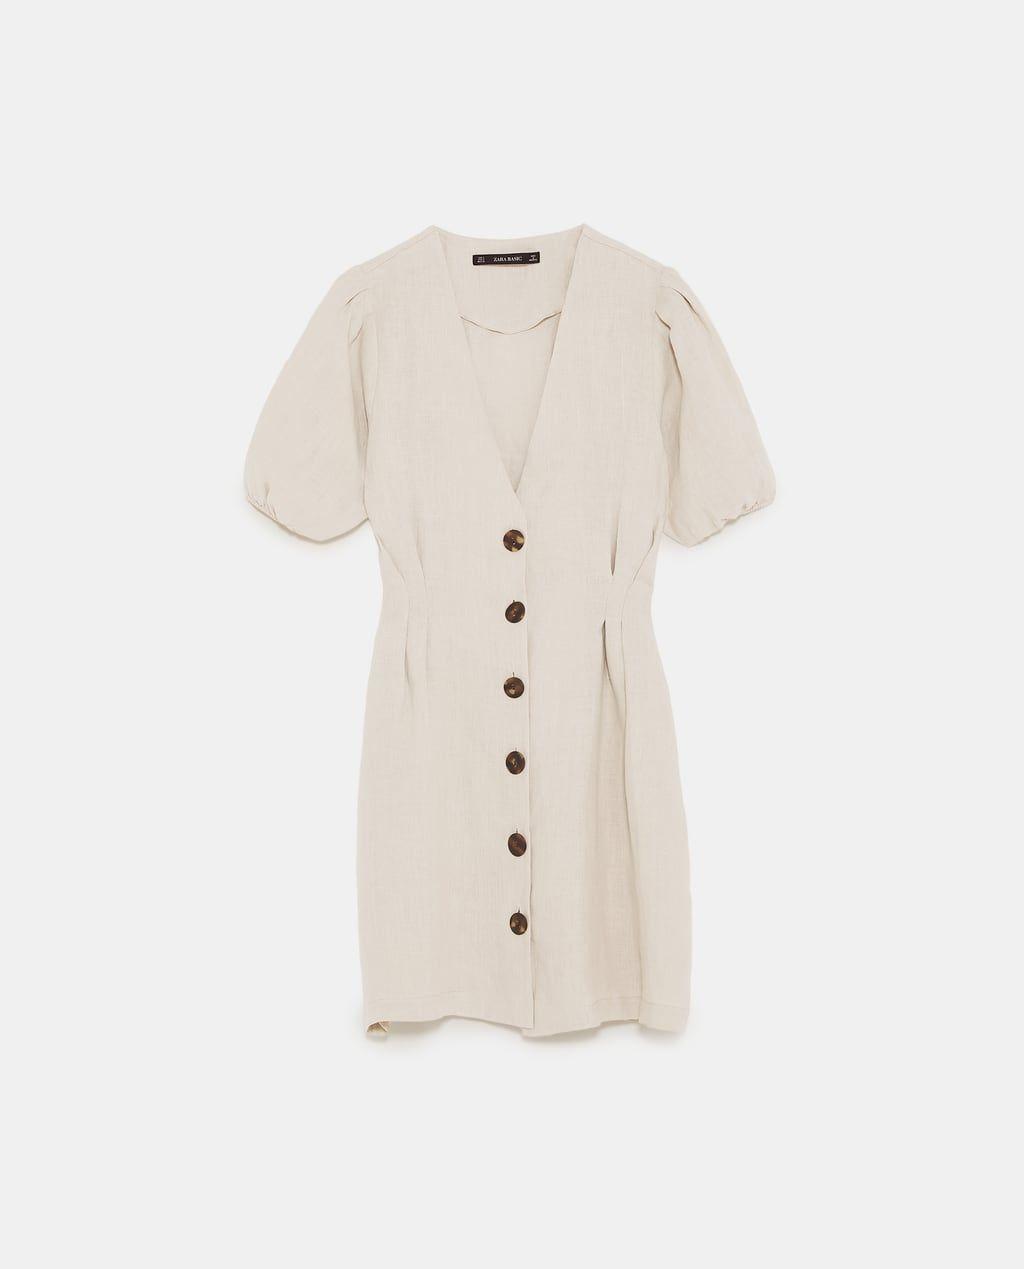 zara buttoned linen kleid for sale 92462 c02df